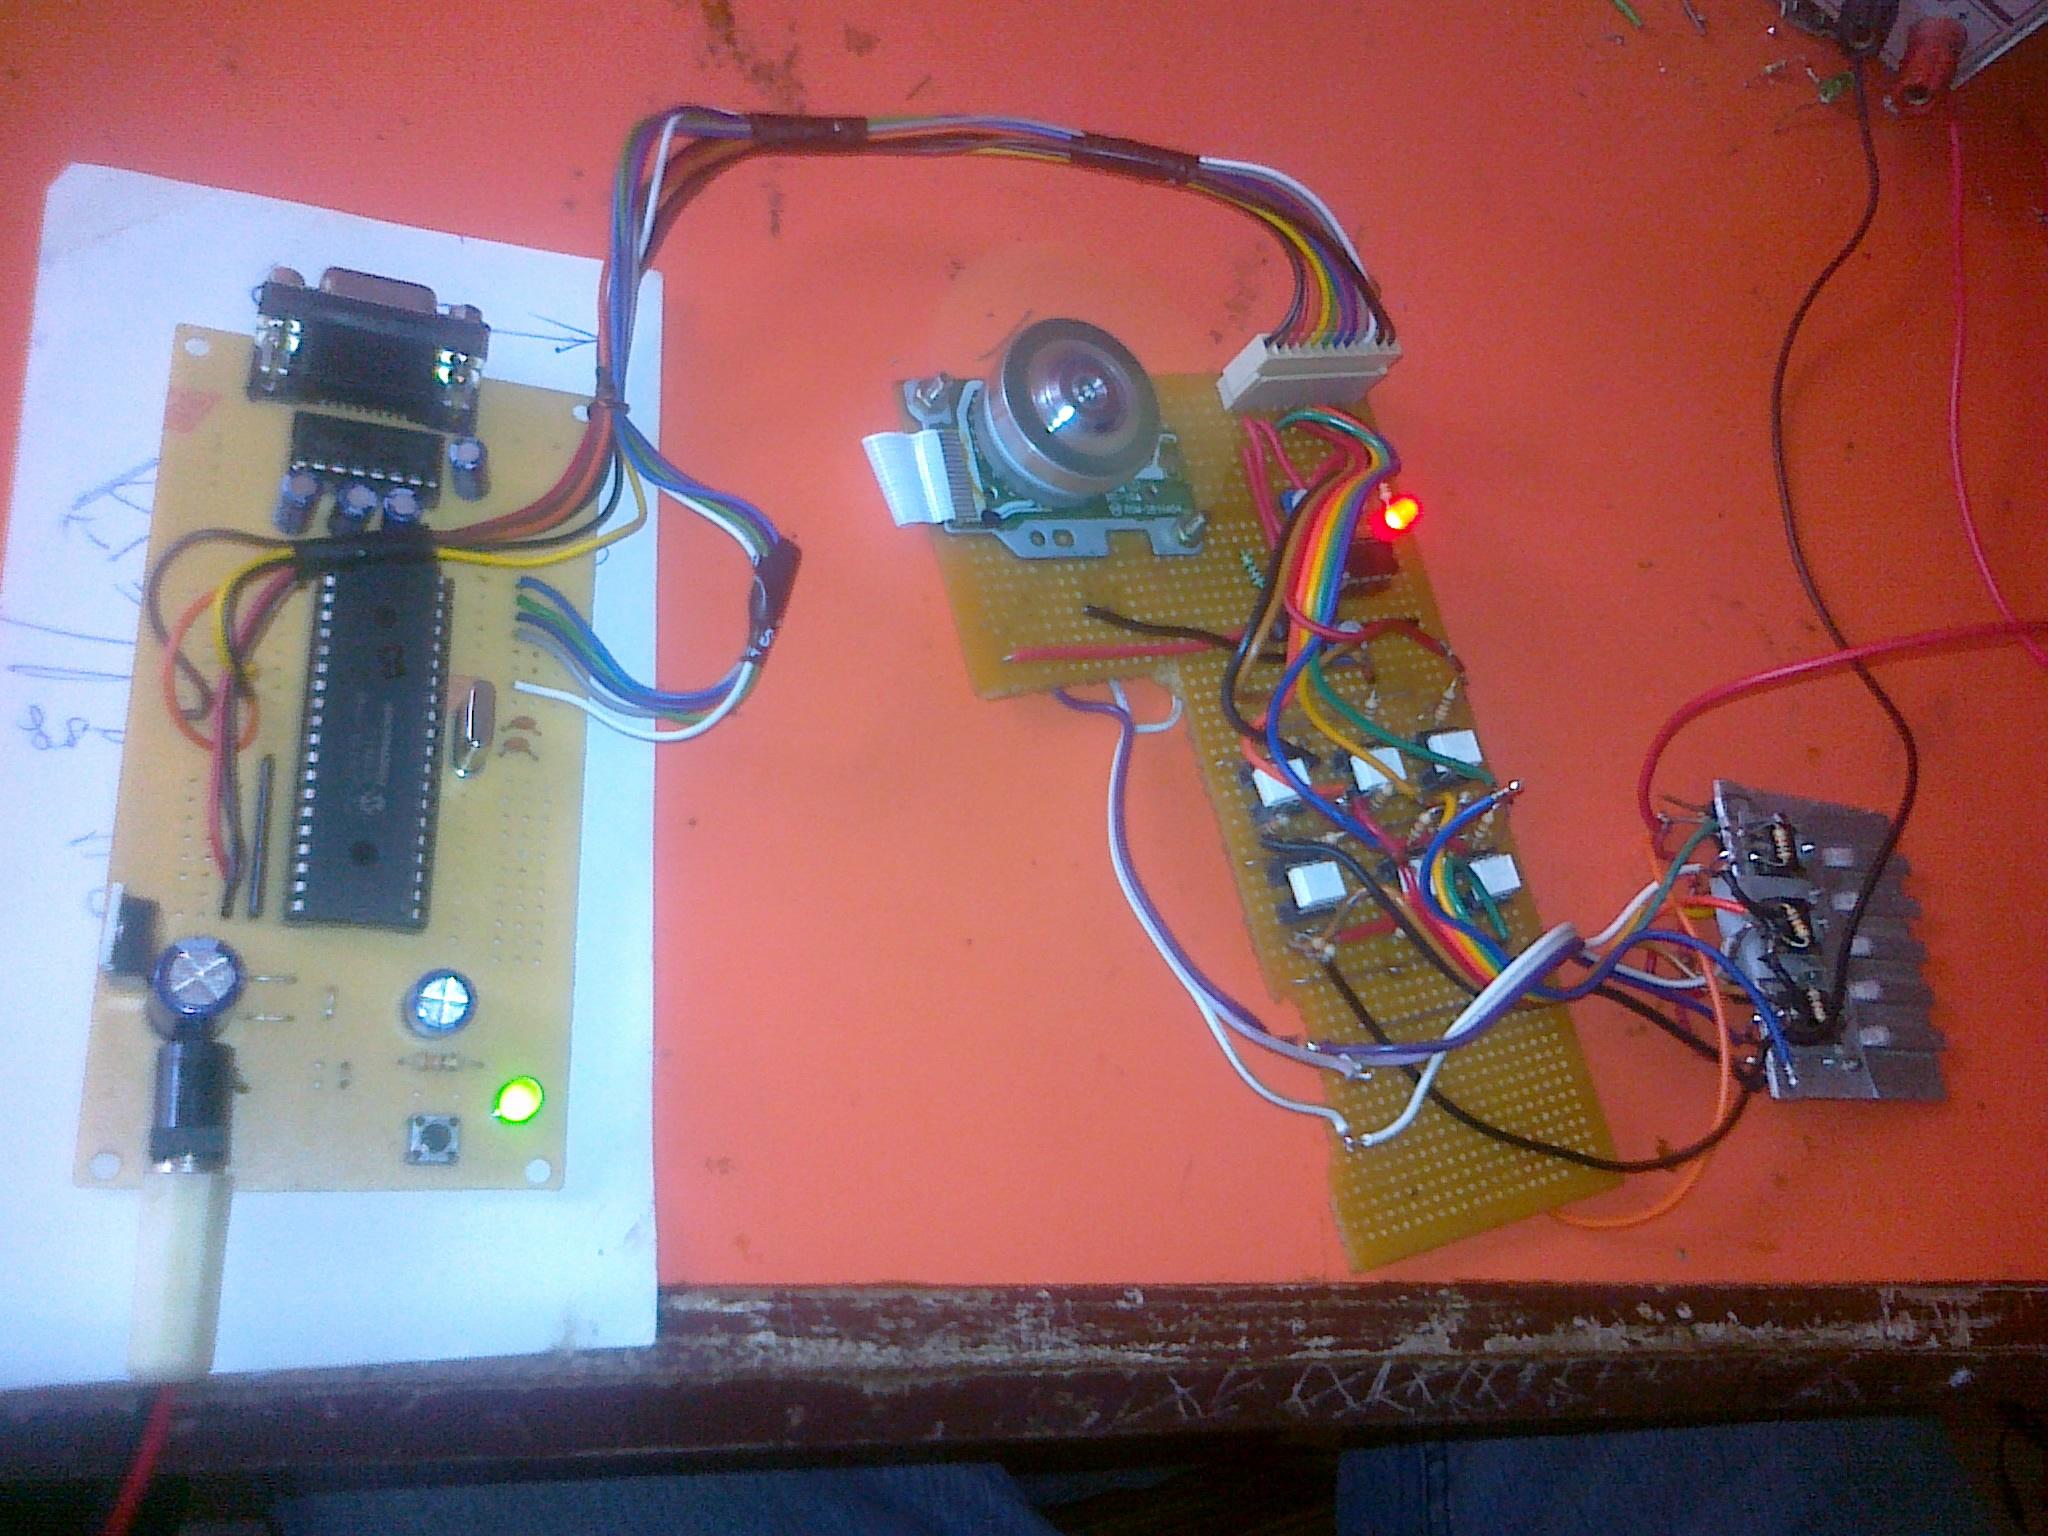 medium resolution of cd rom bldc driver hall effect sensor circuit diagram http wwwedaboardcom